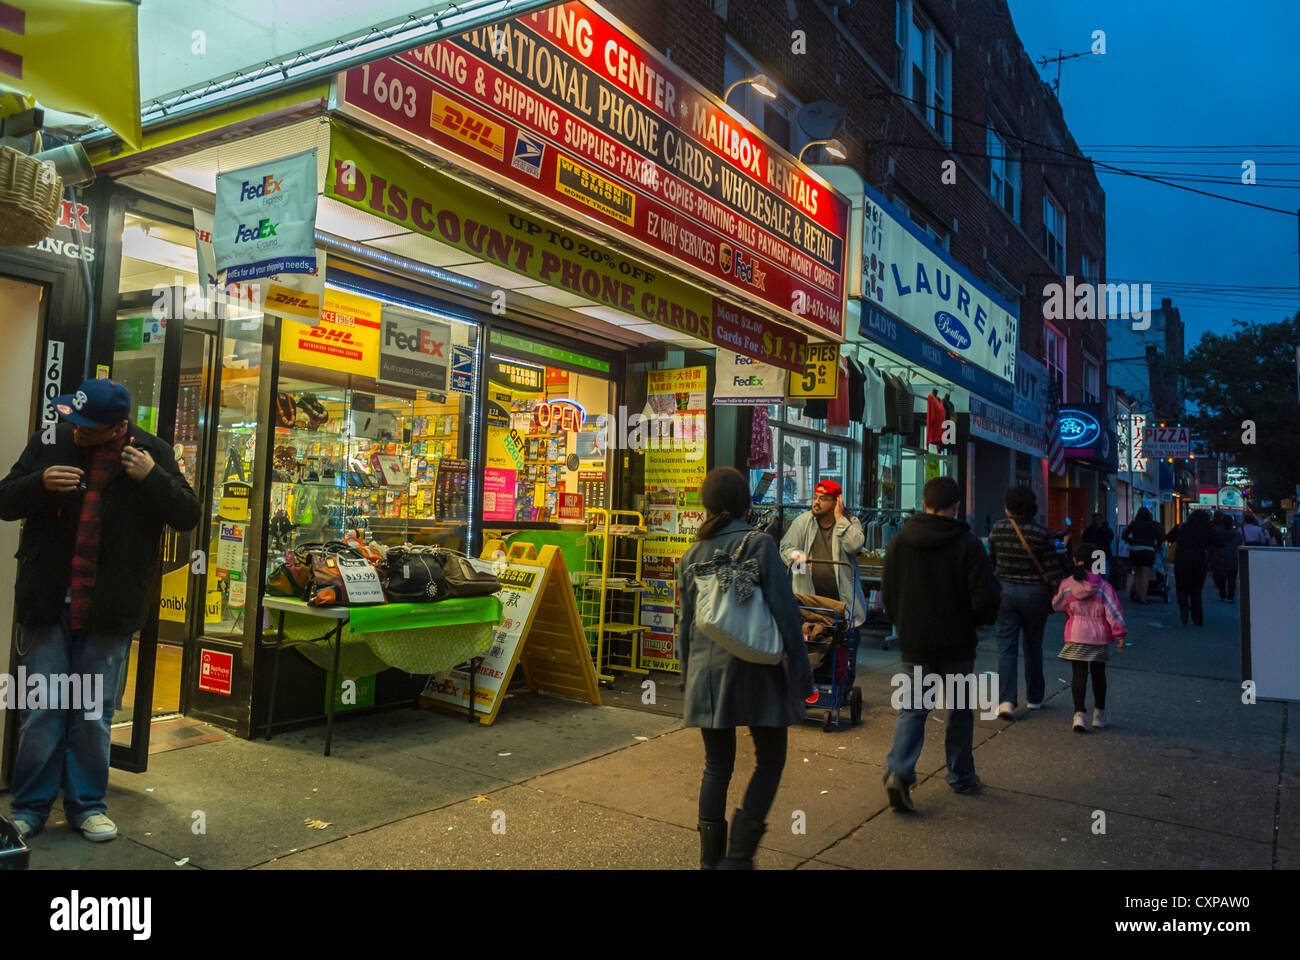 New York City, NY, People Walking on Street, Food Markets